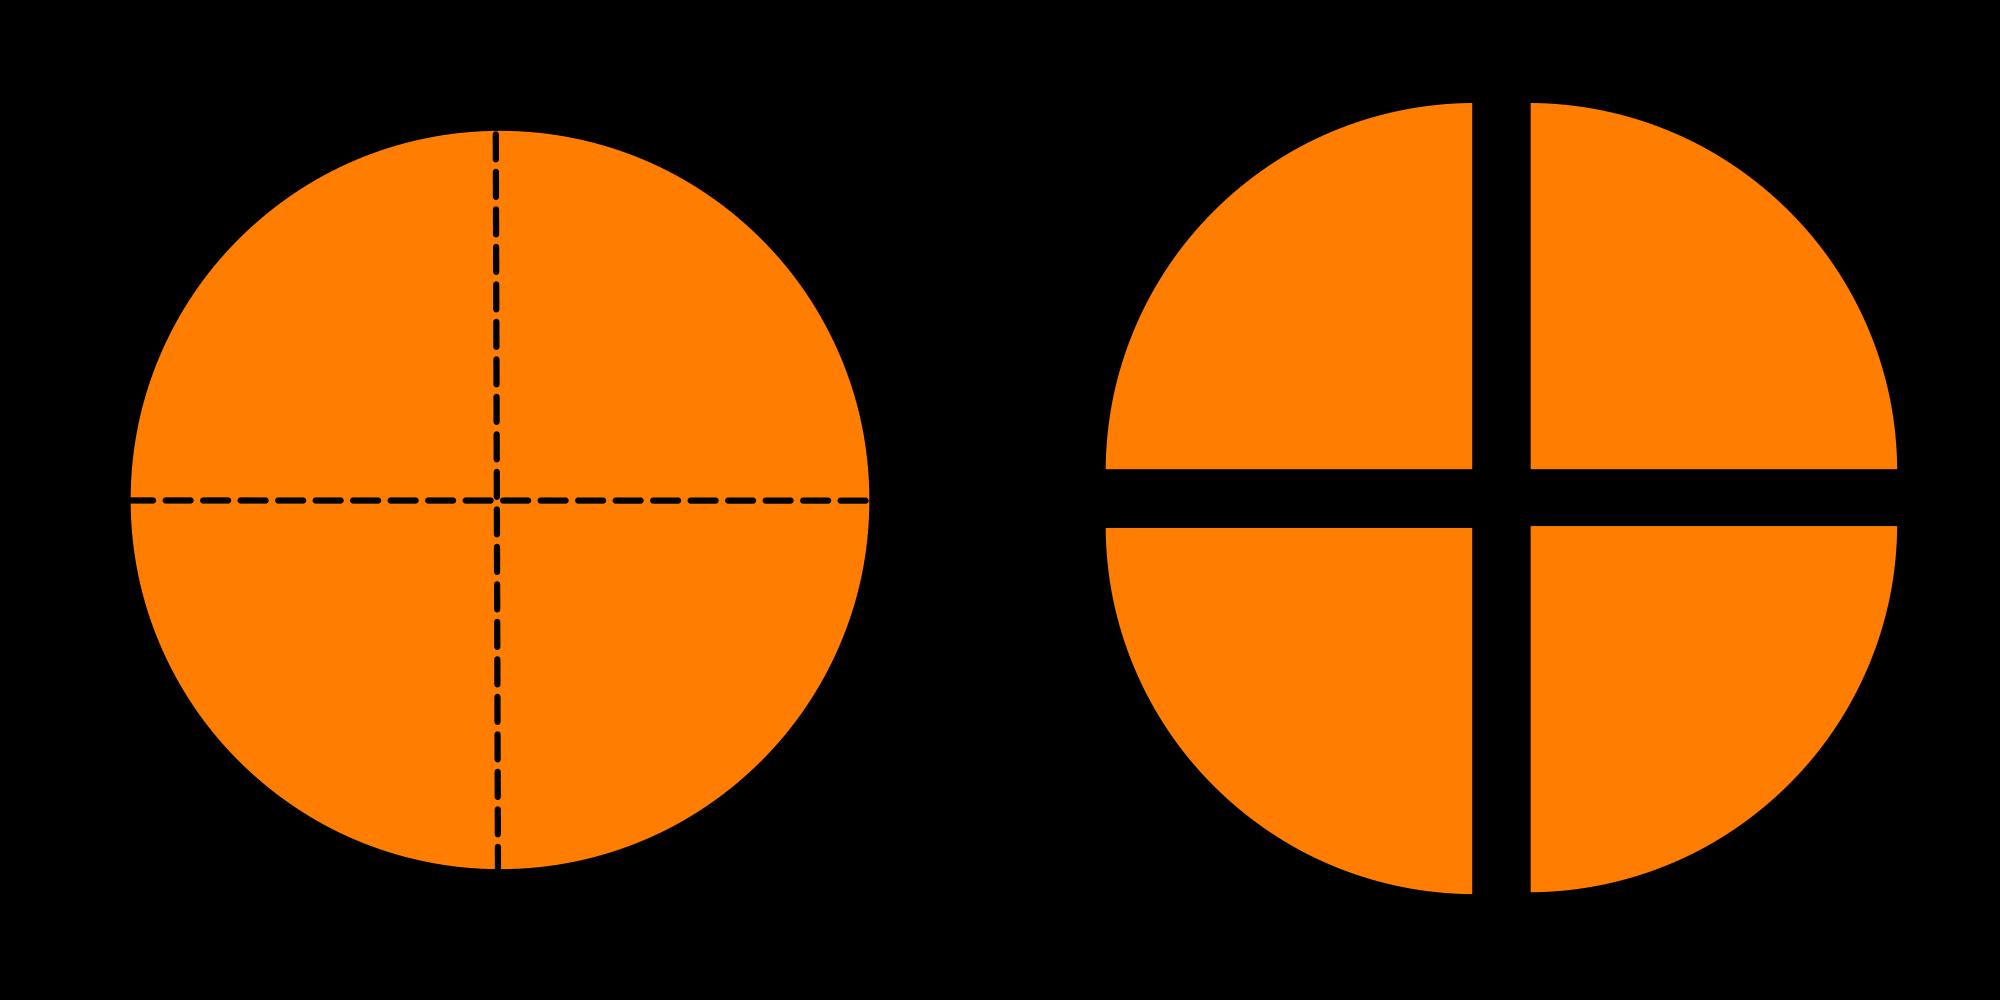 Fraction clipart circle. File piechartfractionbreakfourths svg wikimedia